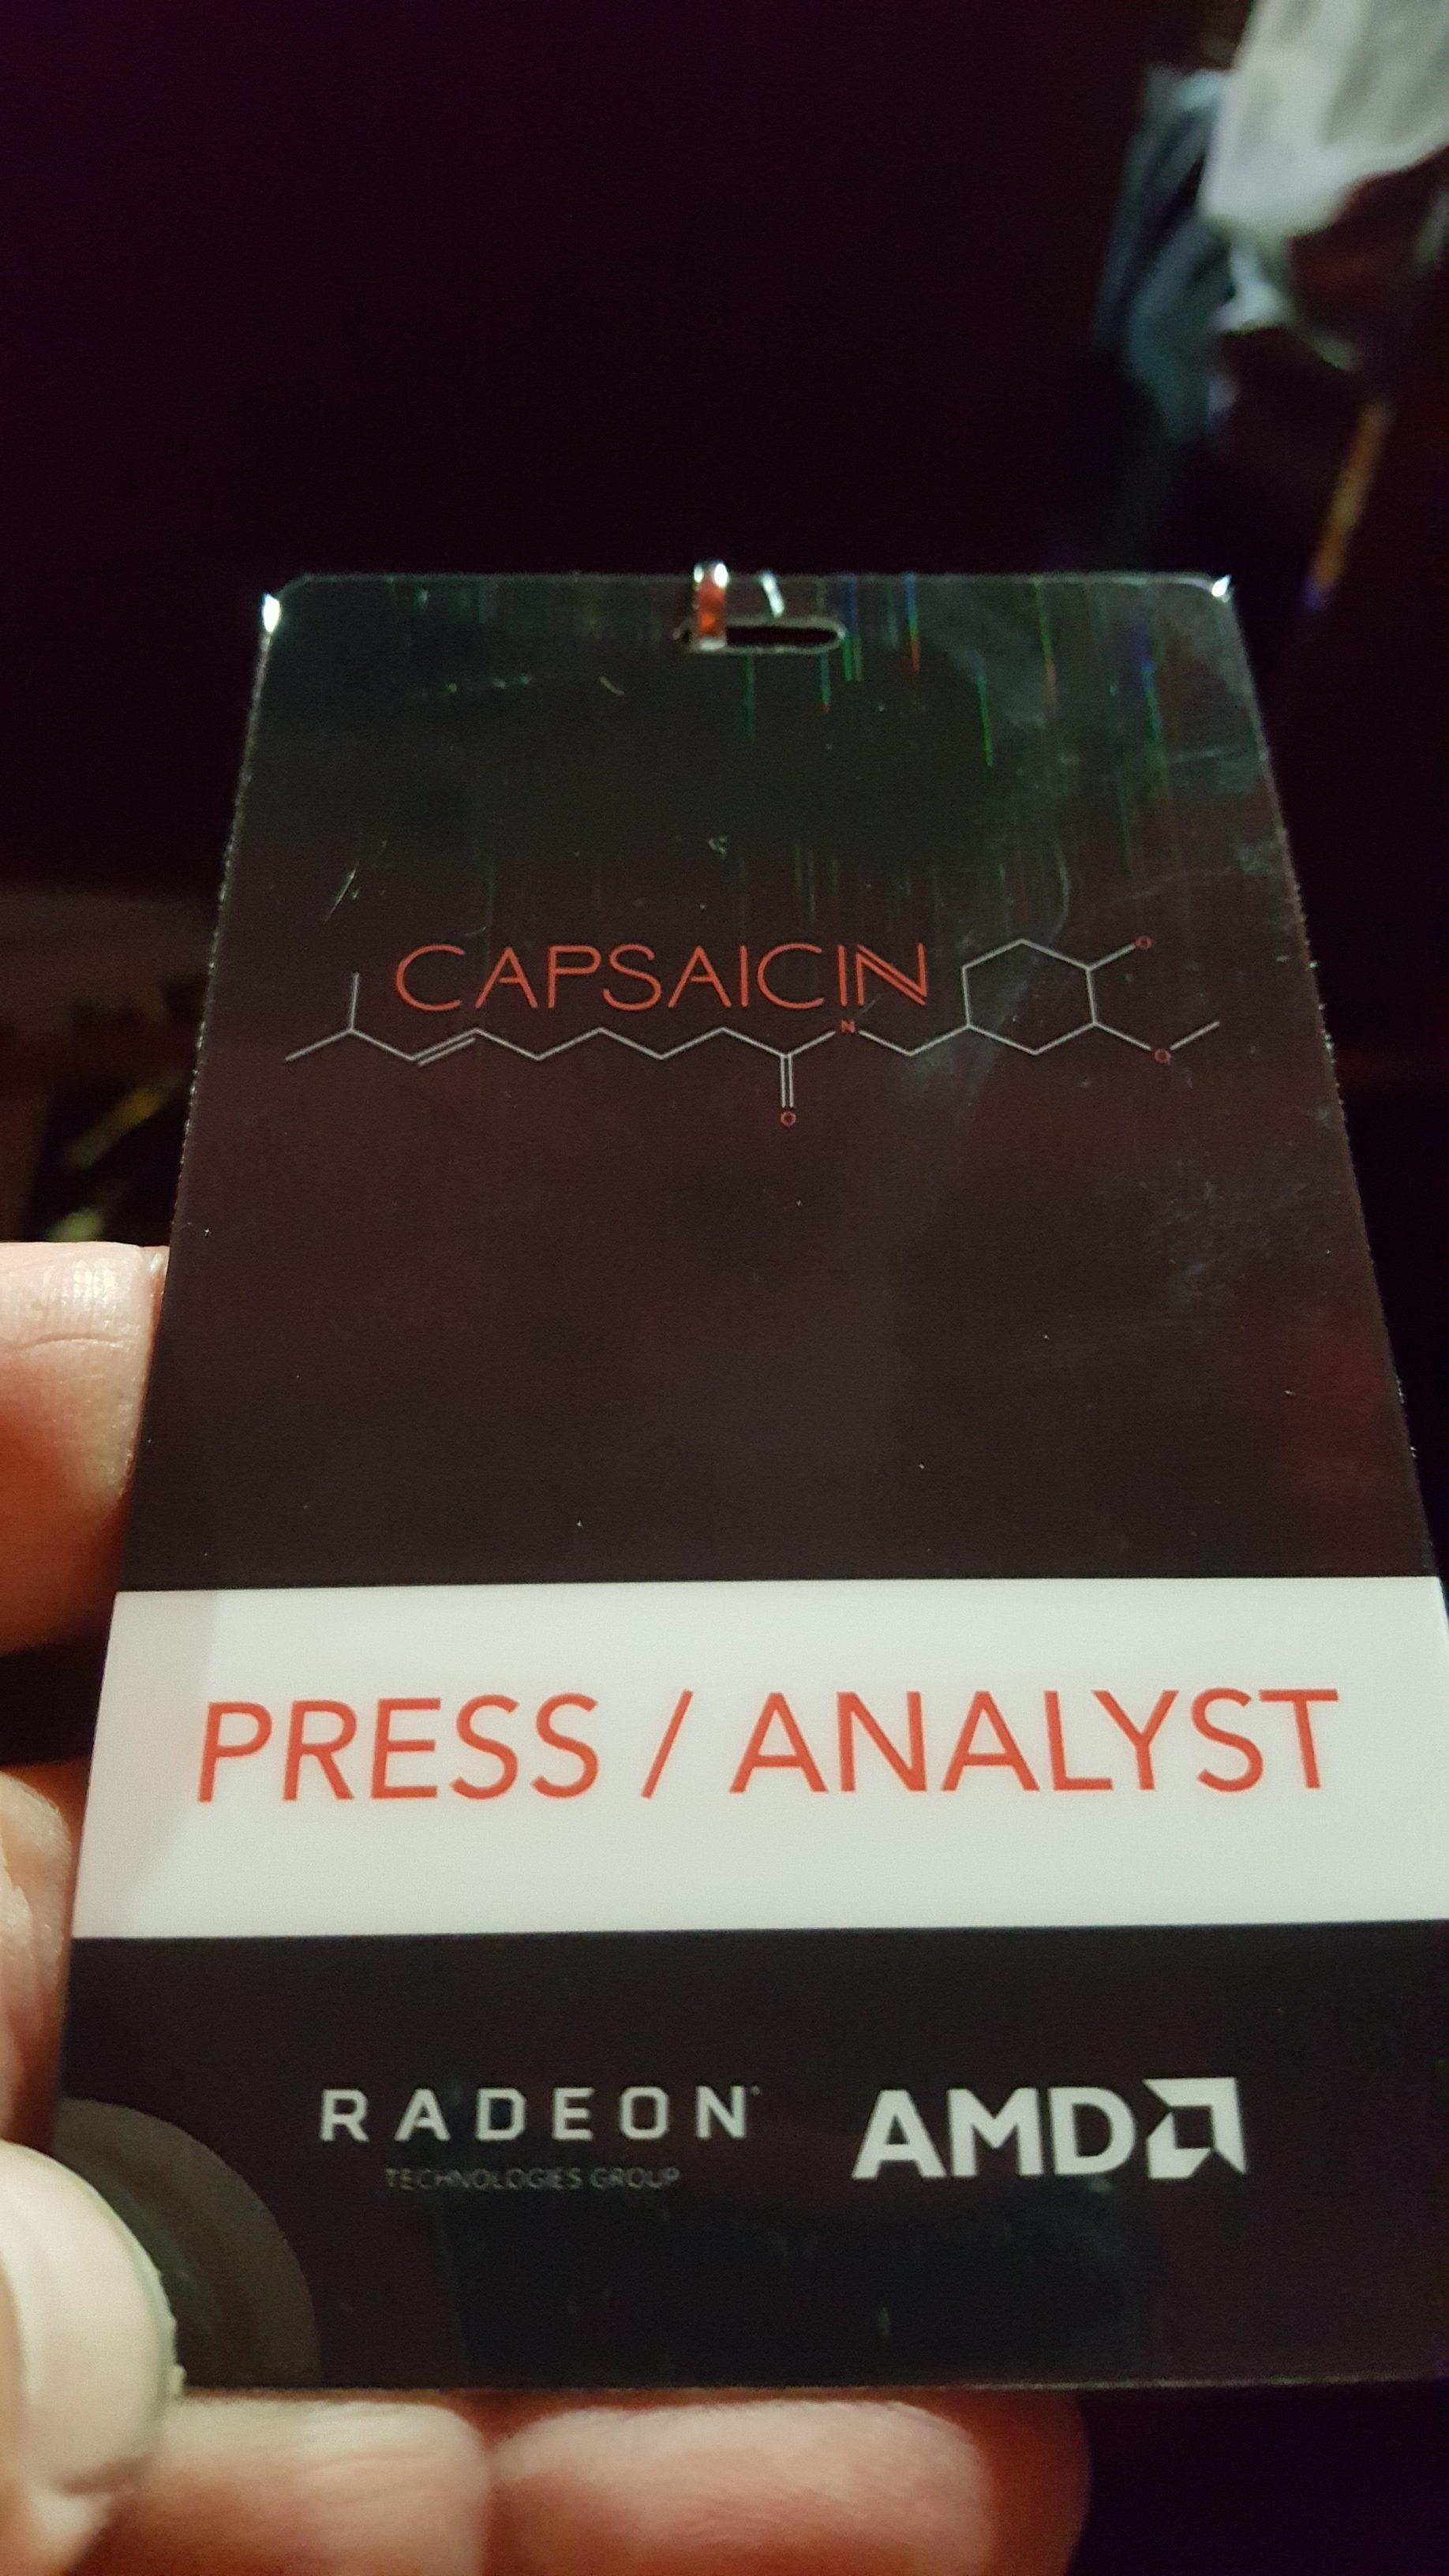 My Capsaicin Press badge.